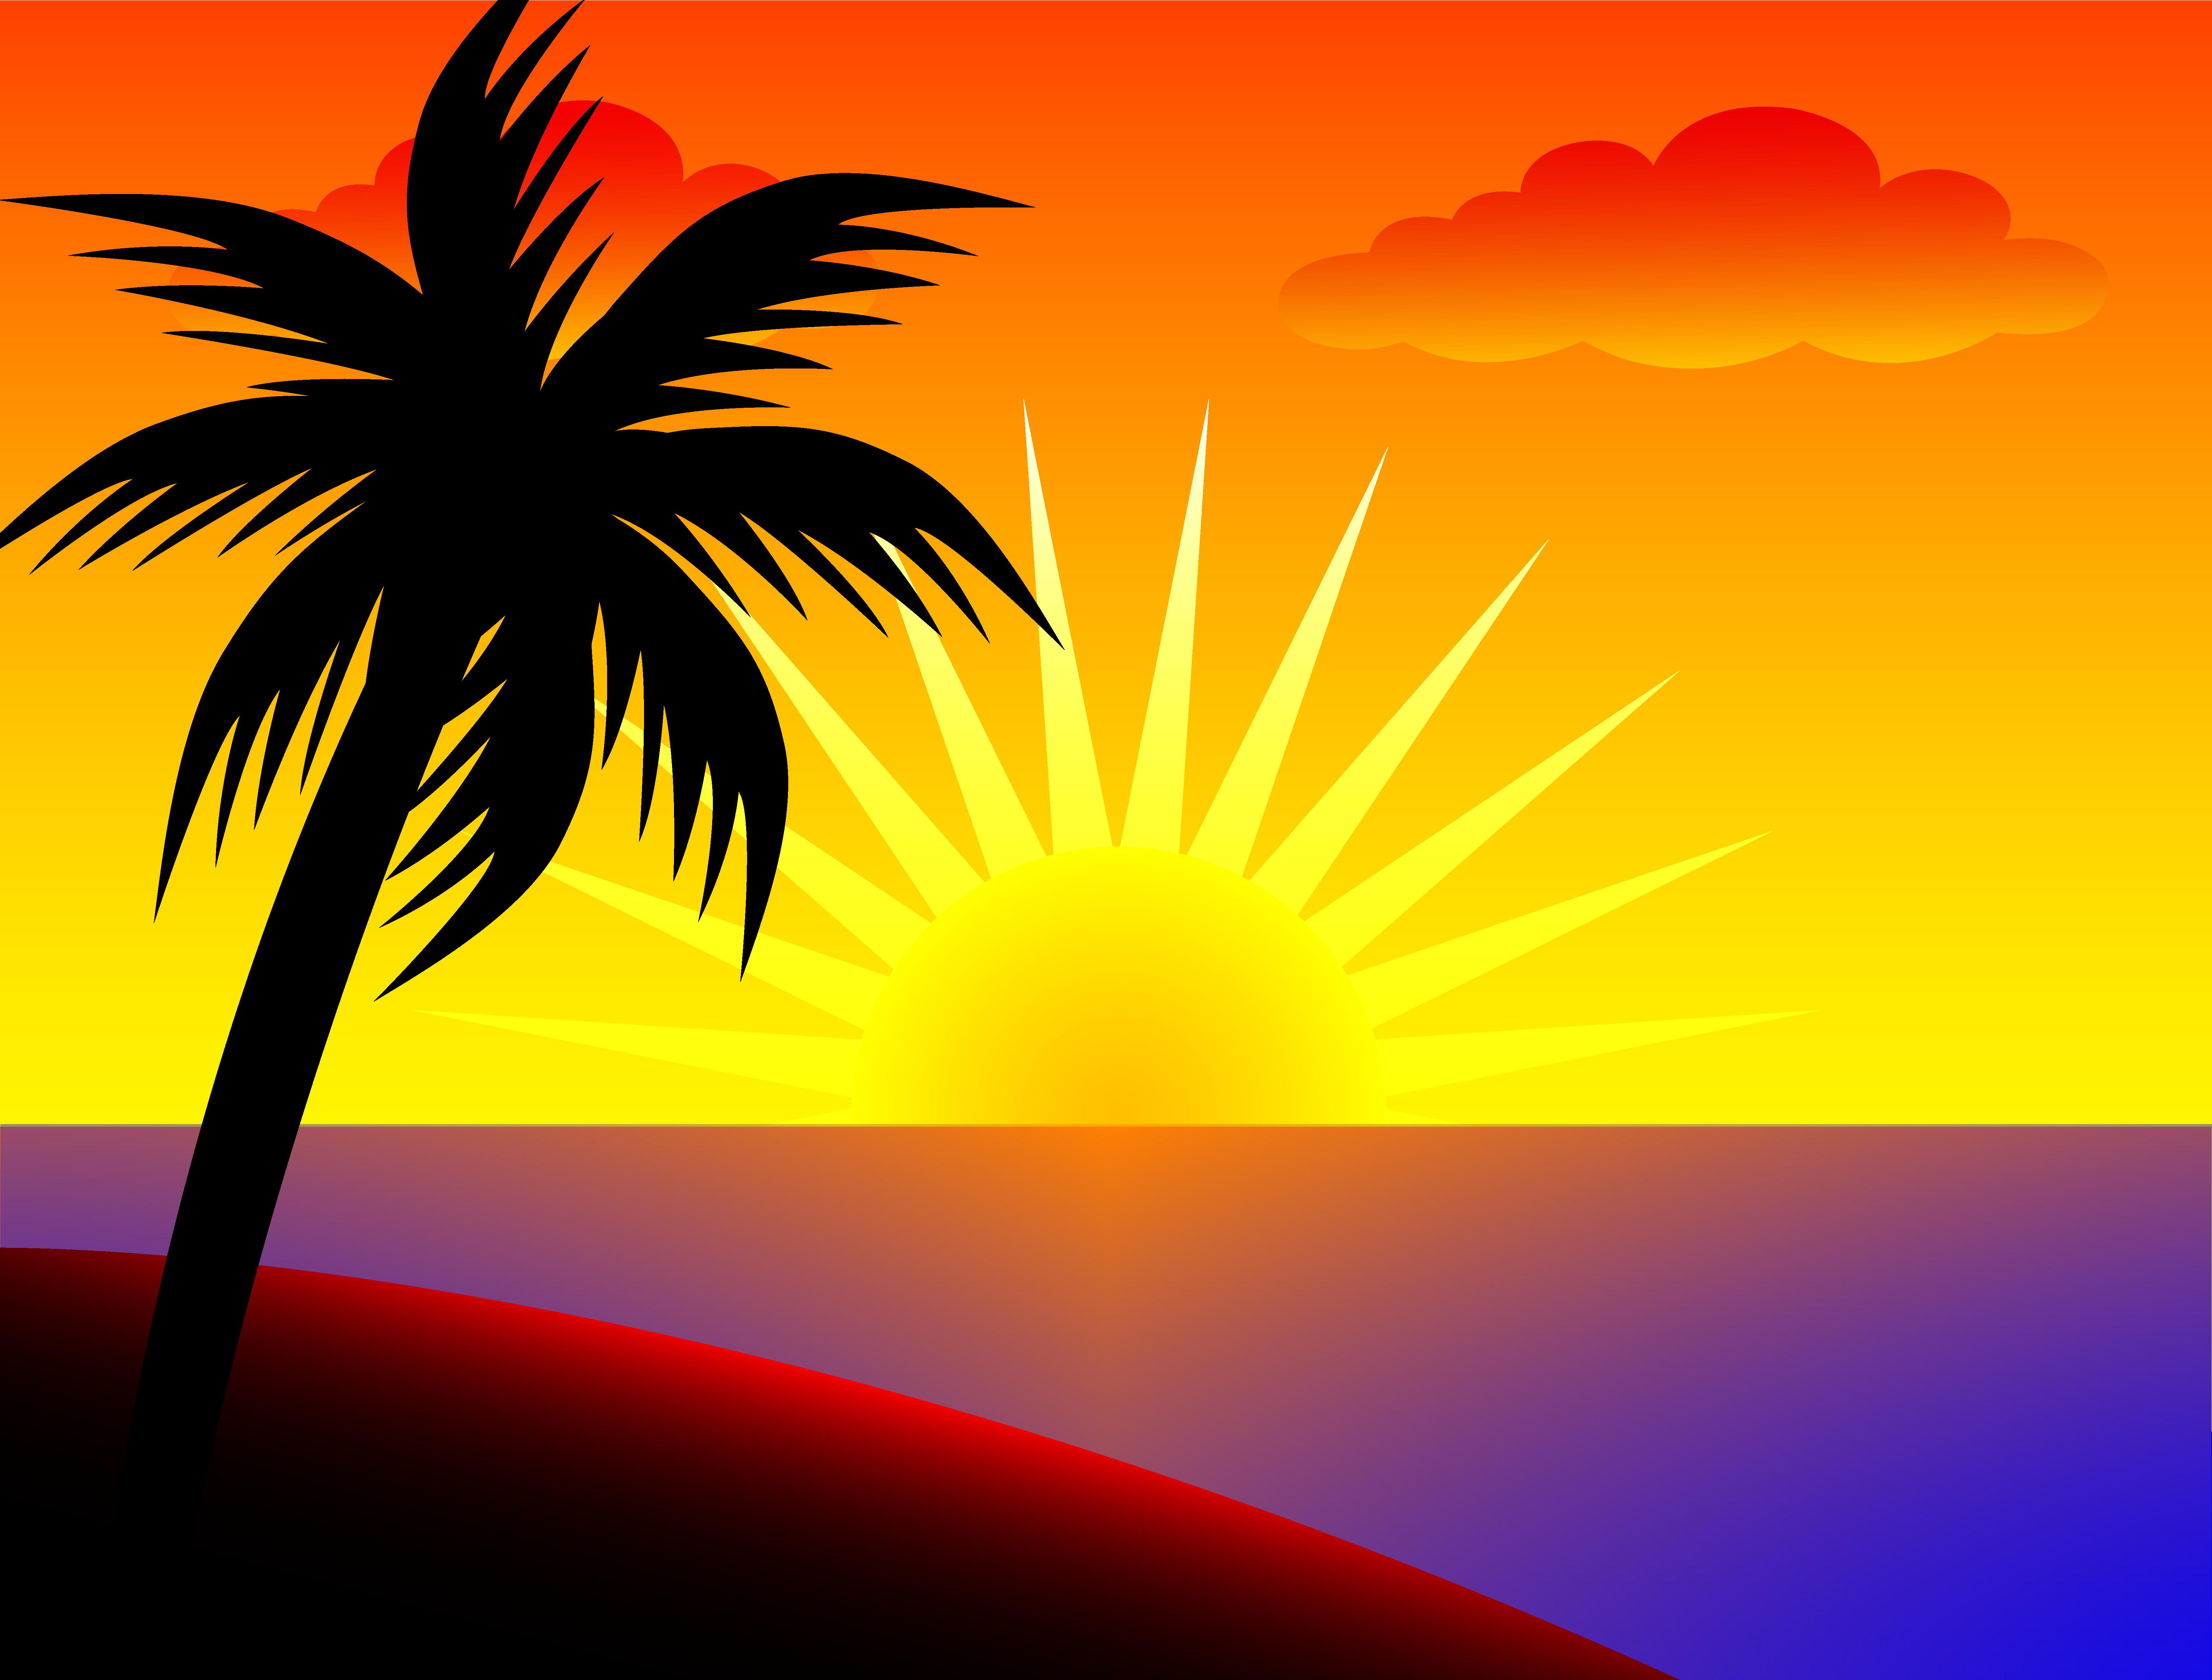 clipart Sunset clipart. Sun clip art over.